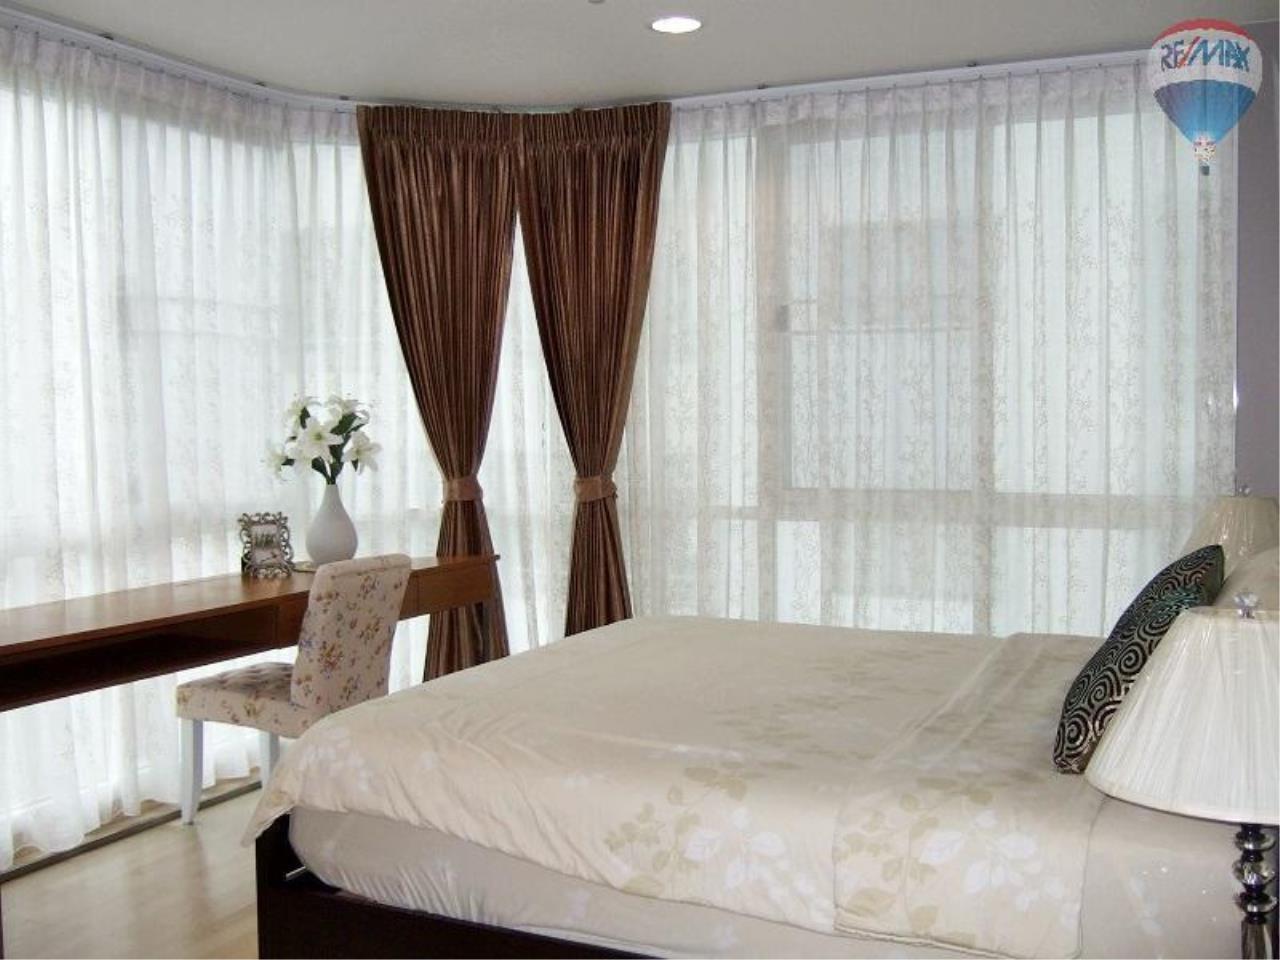 RE/MAX Properties Agency's Condominium for rent 2 bedrooms 66.17 Sq.m. at 59 Heritage 2